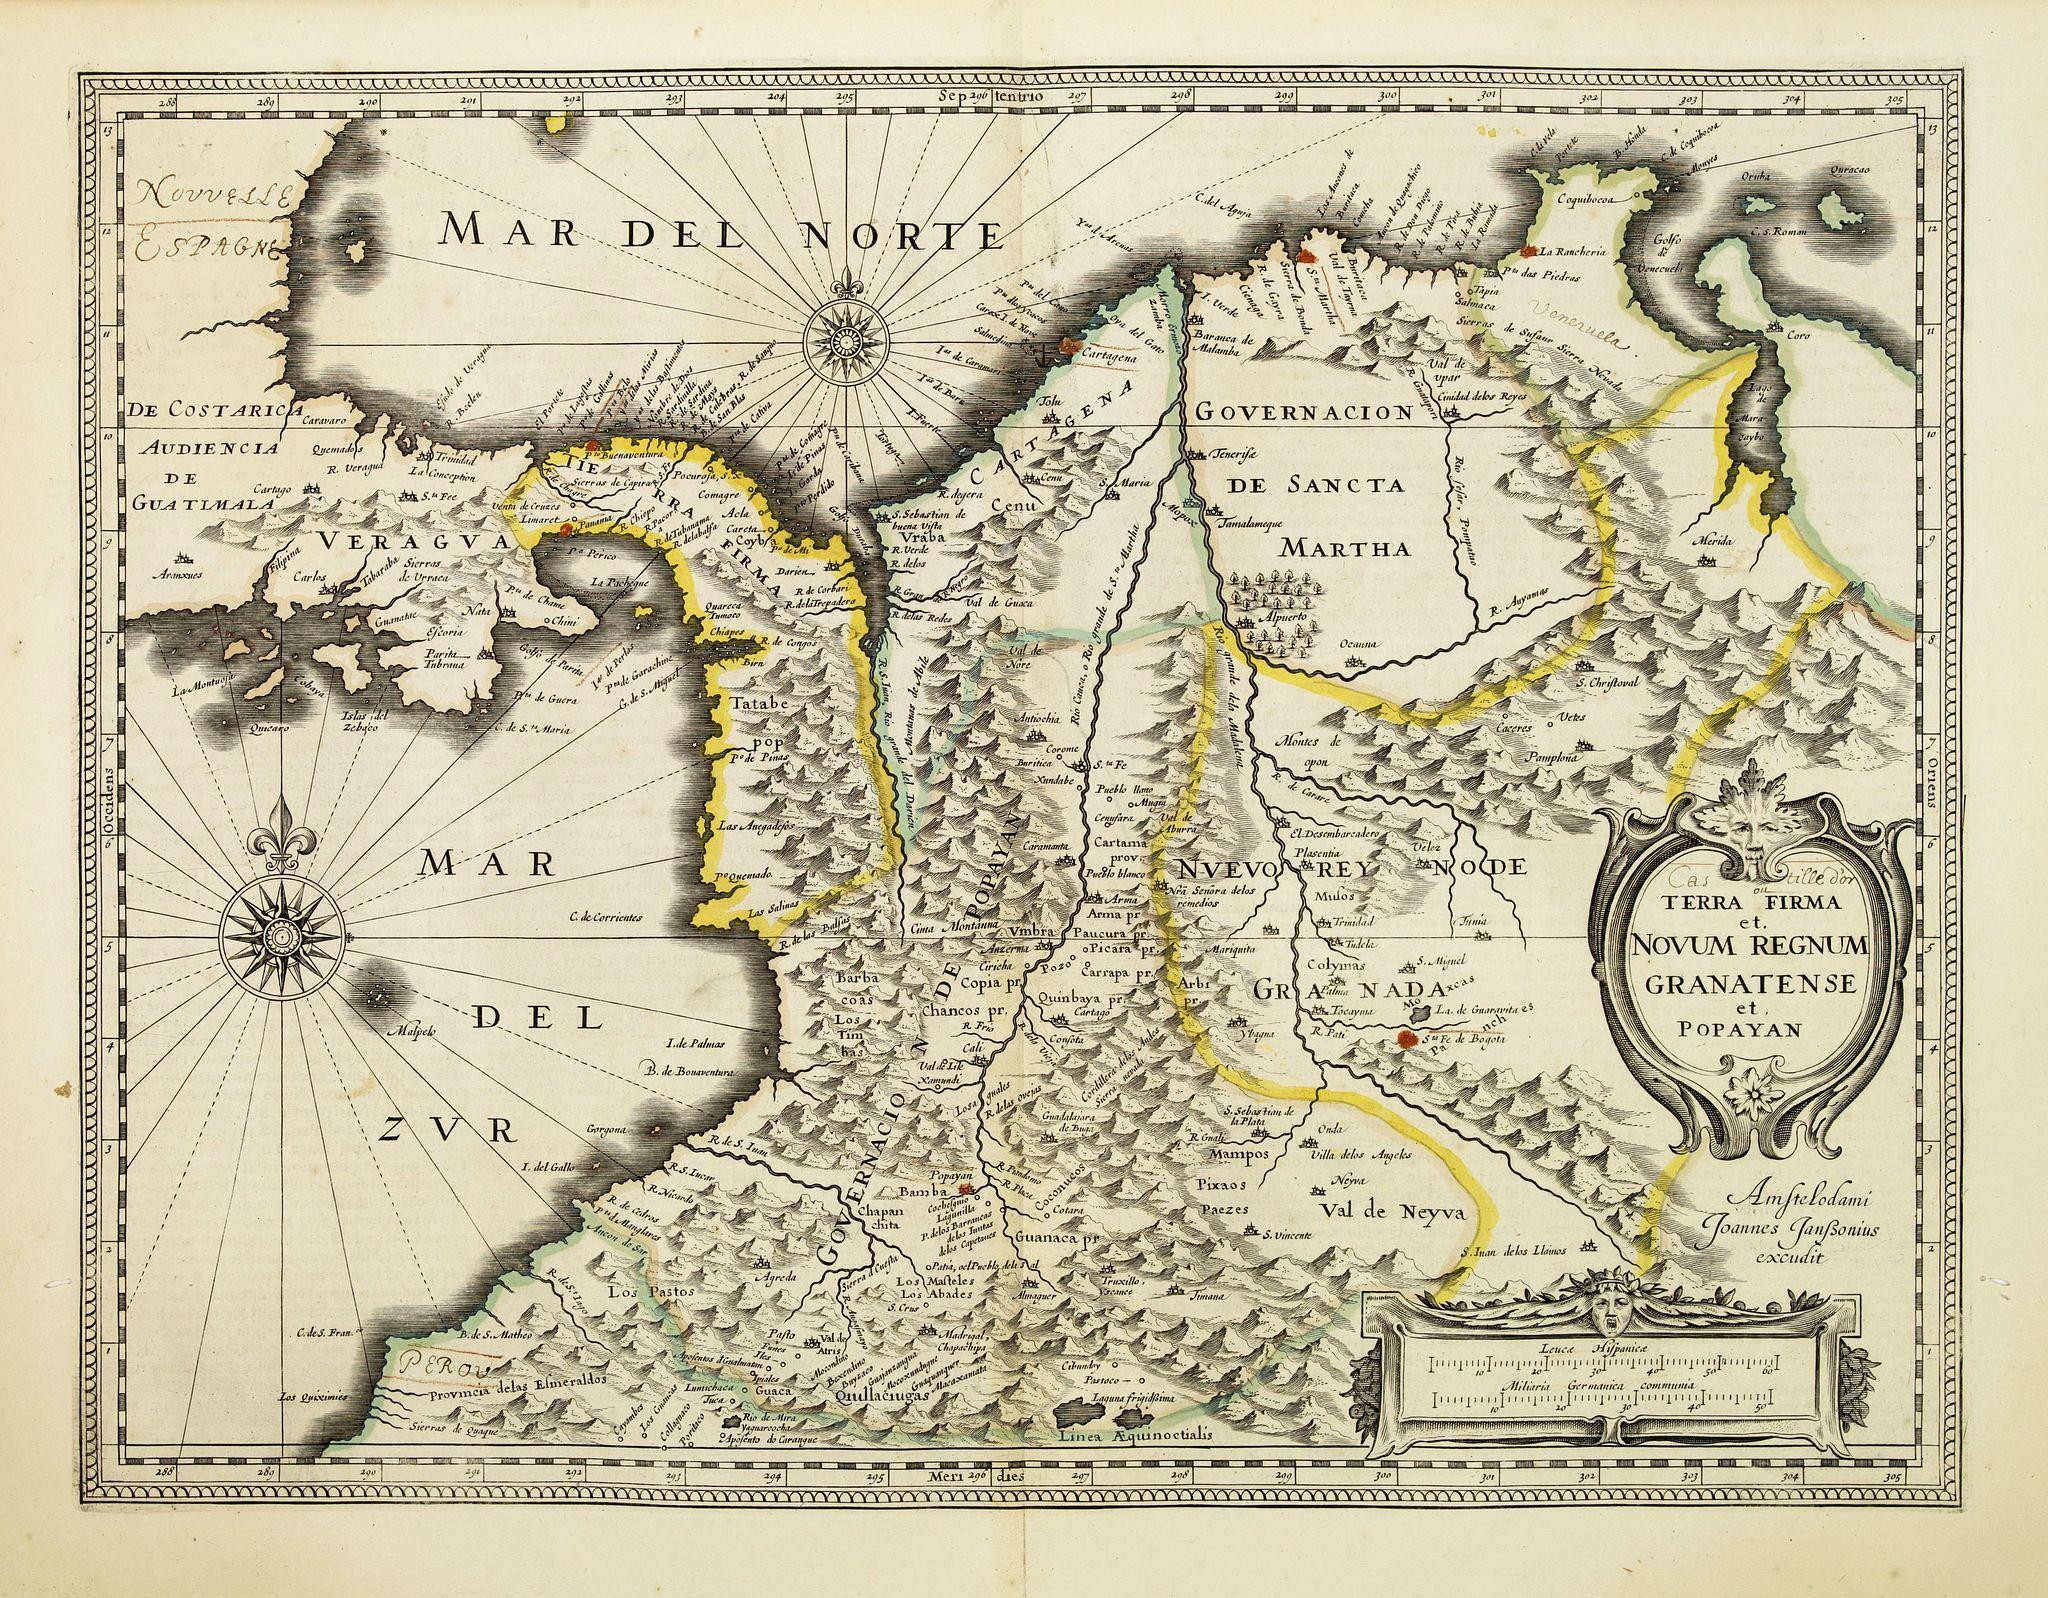 JANSSONIUS, J. -  Terra Firma et Novum regnum Granatense et Propayan.